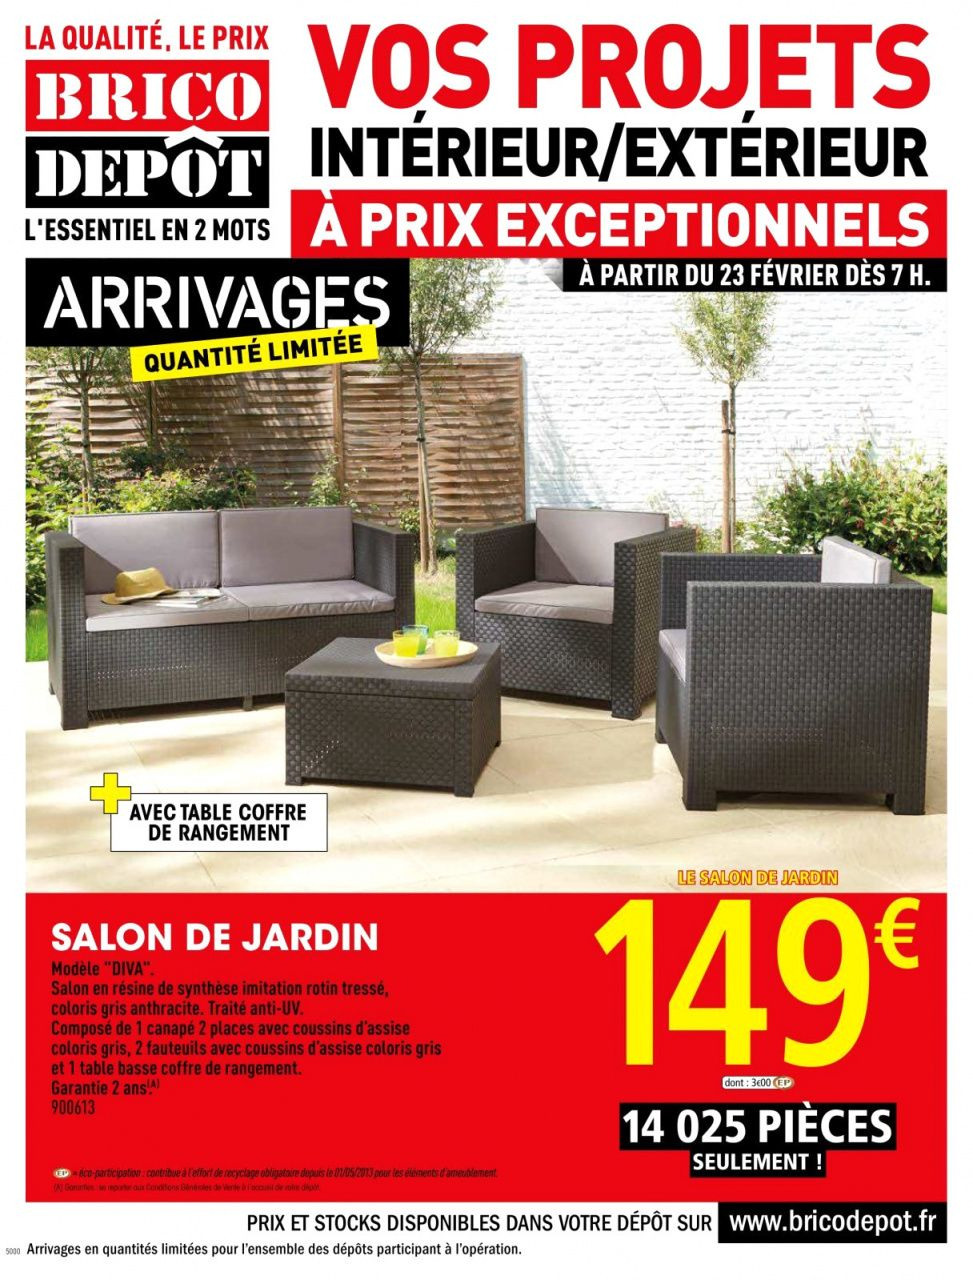 70 Salon De Jardin Allibert Brico Depot | Outdoor Furniture ... concernant Mobilier Jardin Brico Depot